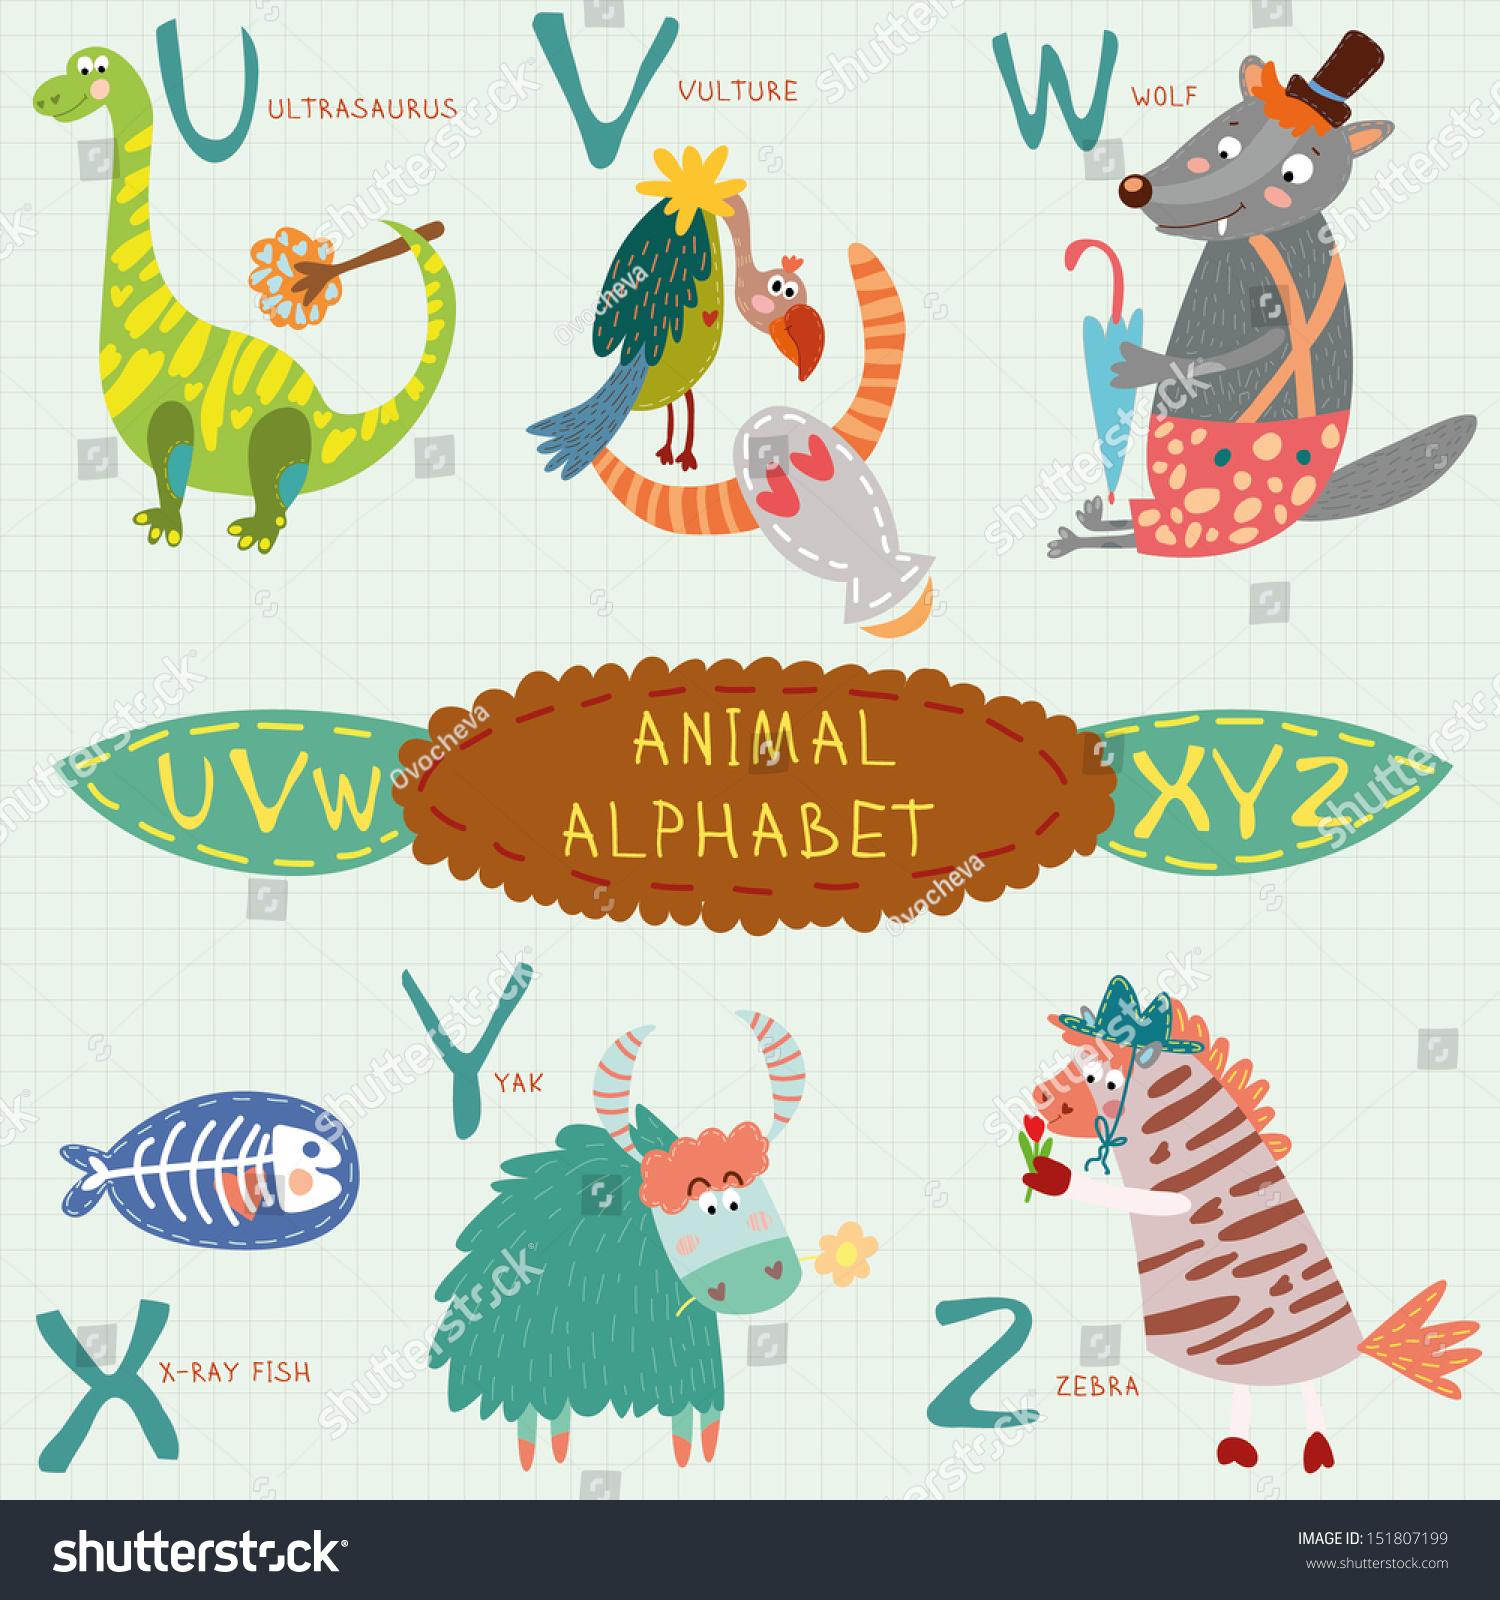 Cute Animal Alphabet U V W Stock Vector 151807199 - Shutterstock